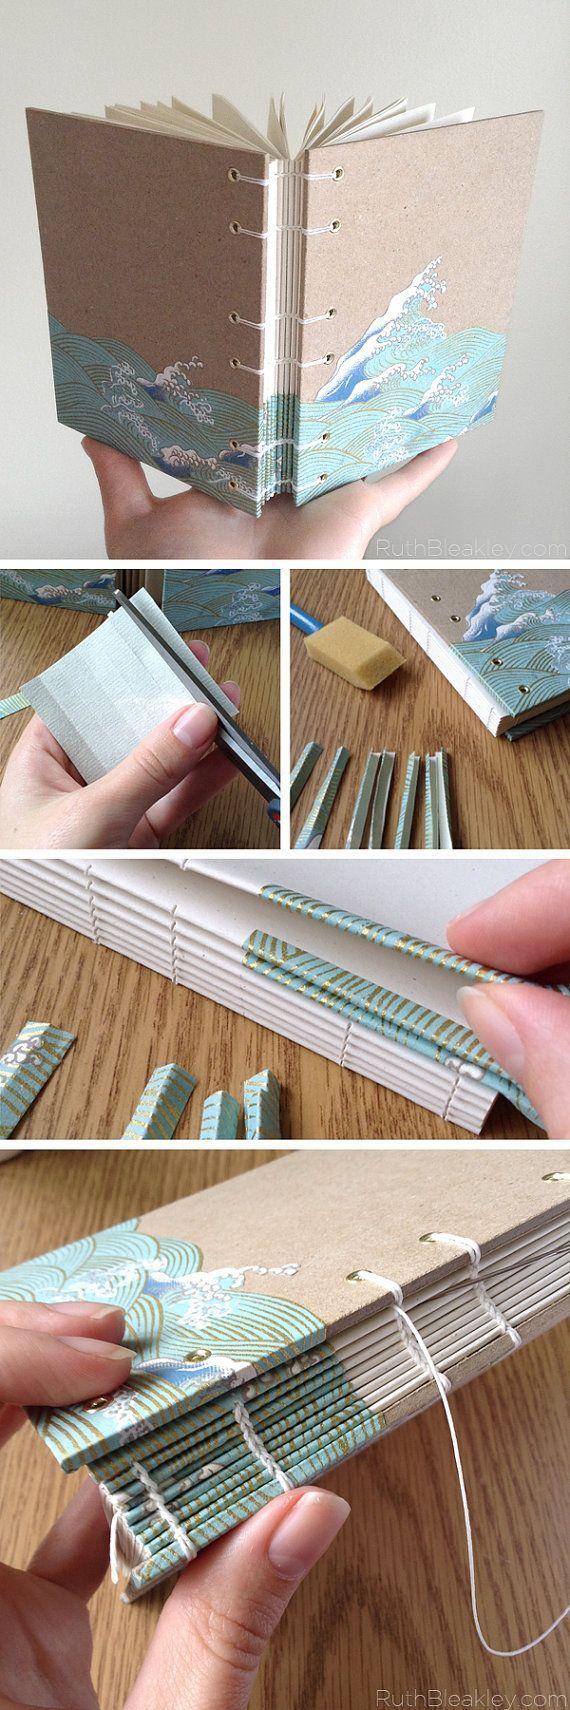 Revista hecha a mano con ondas recortadas de papel por RuthBleakley